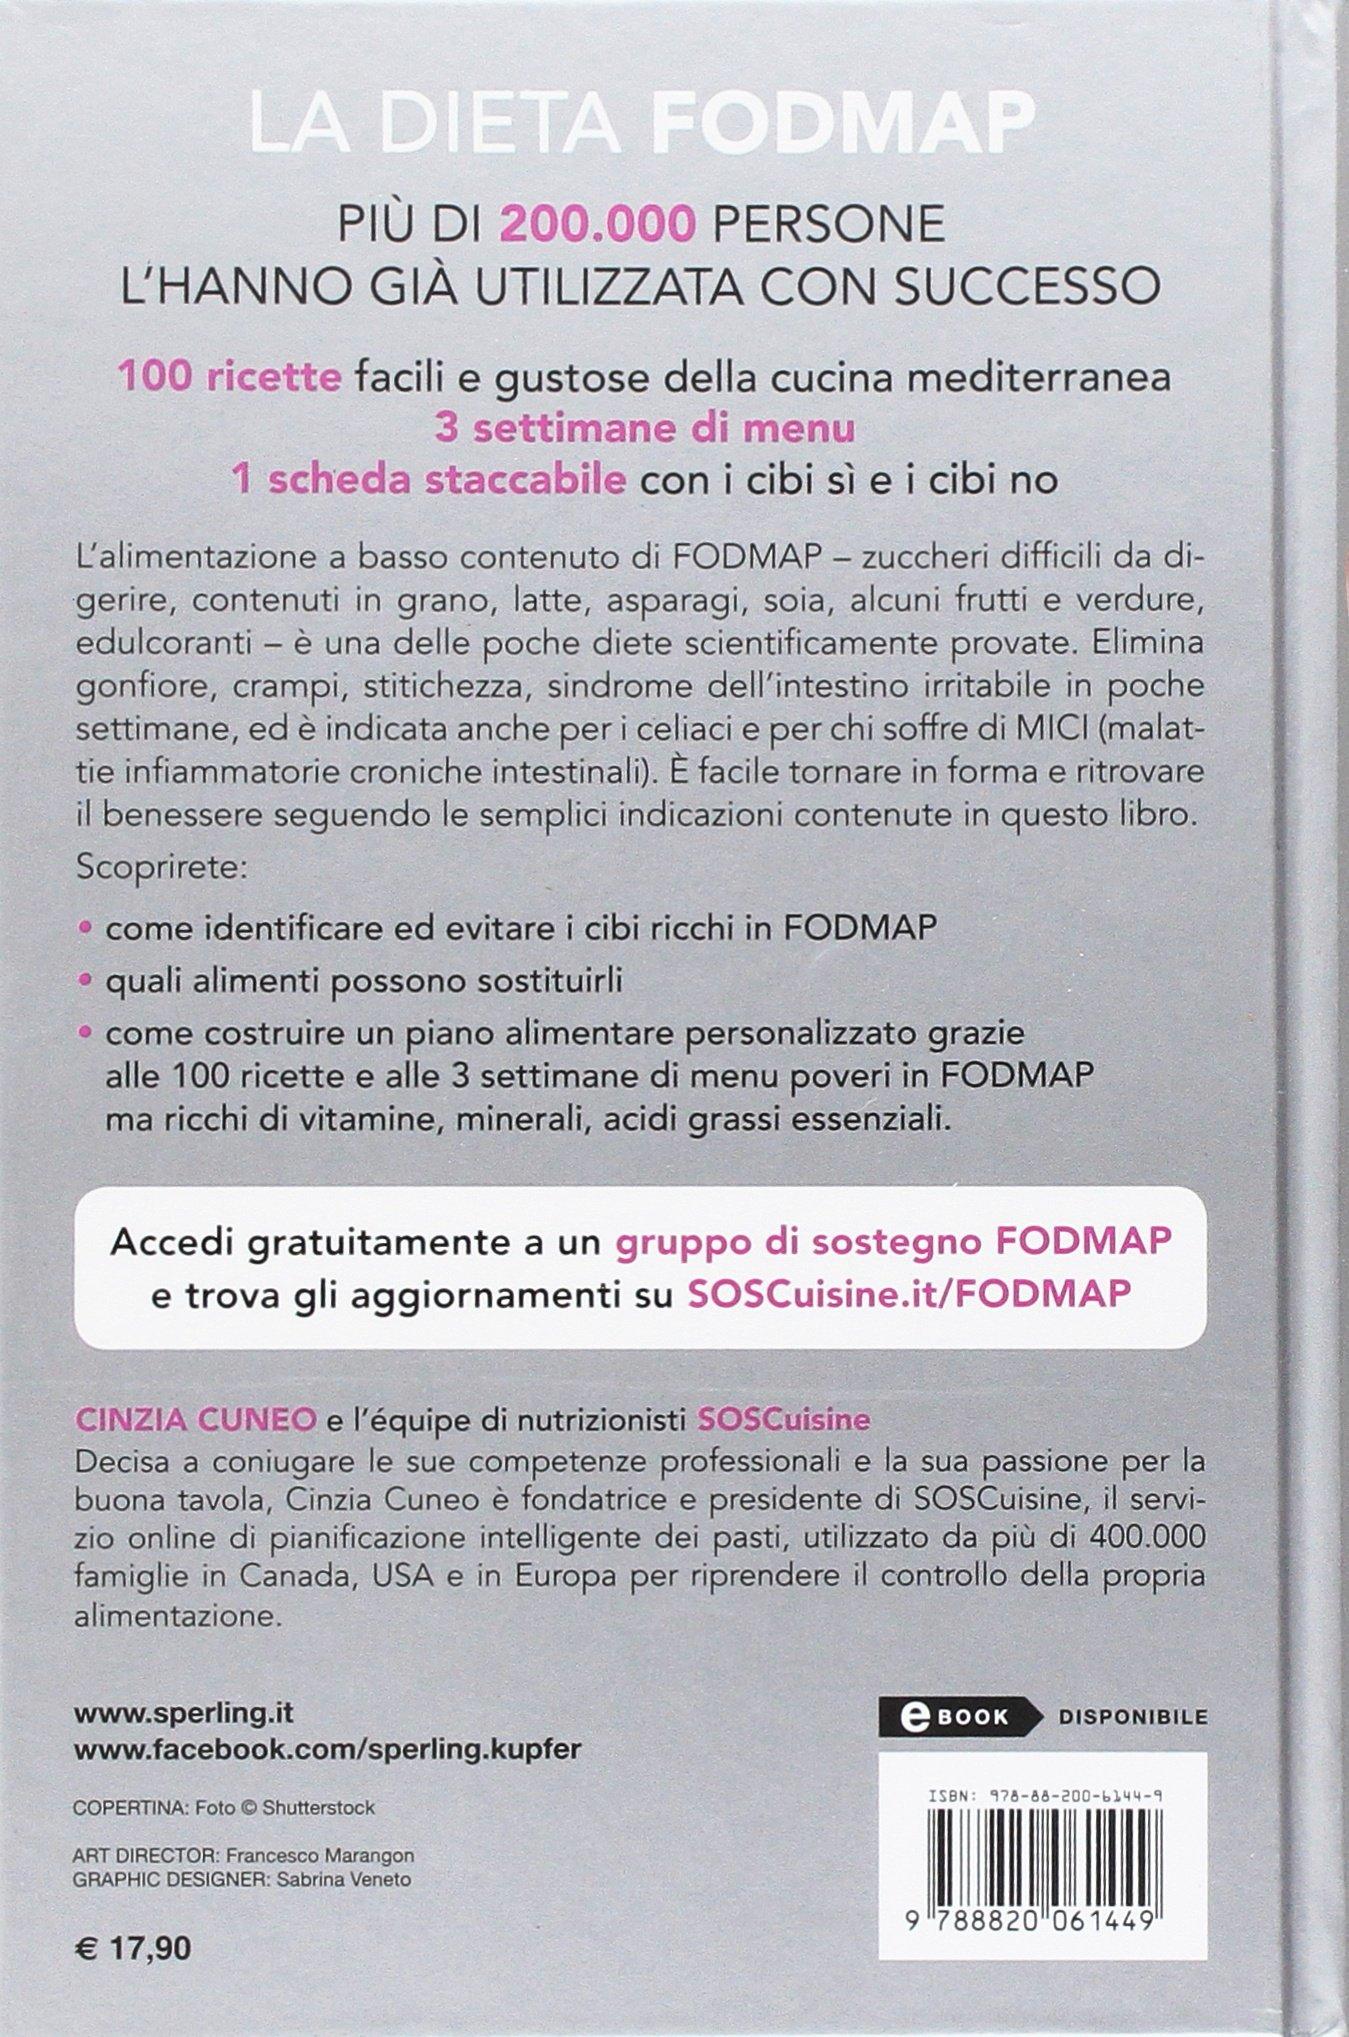 La Dieta Fodmap Cinzia Cuneo 9788820061449 Amazon Com Books